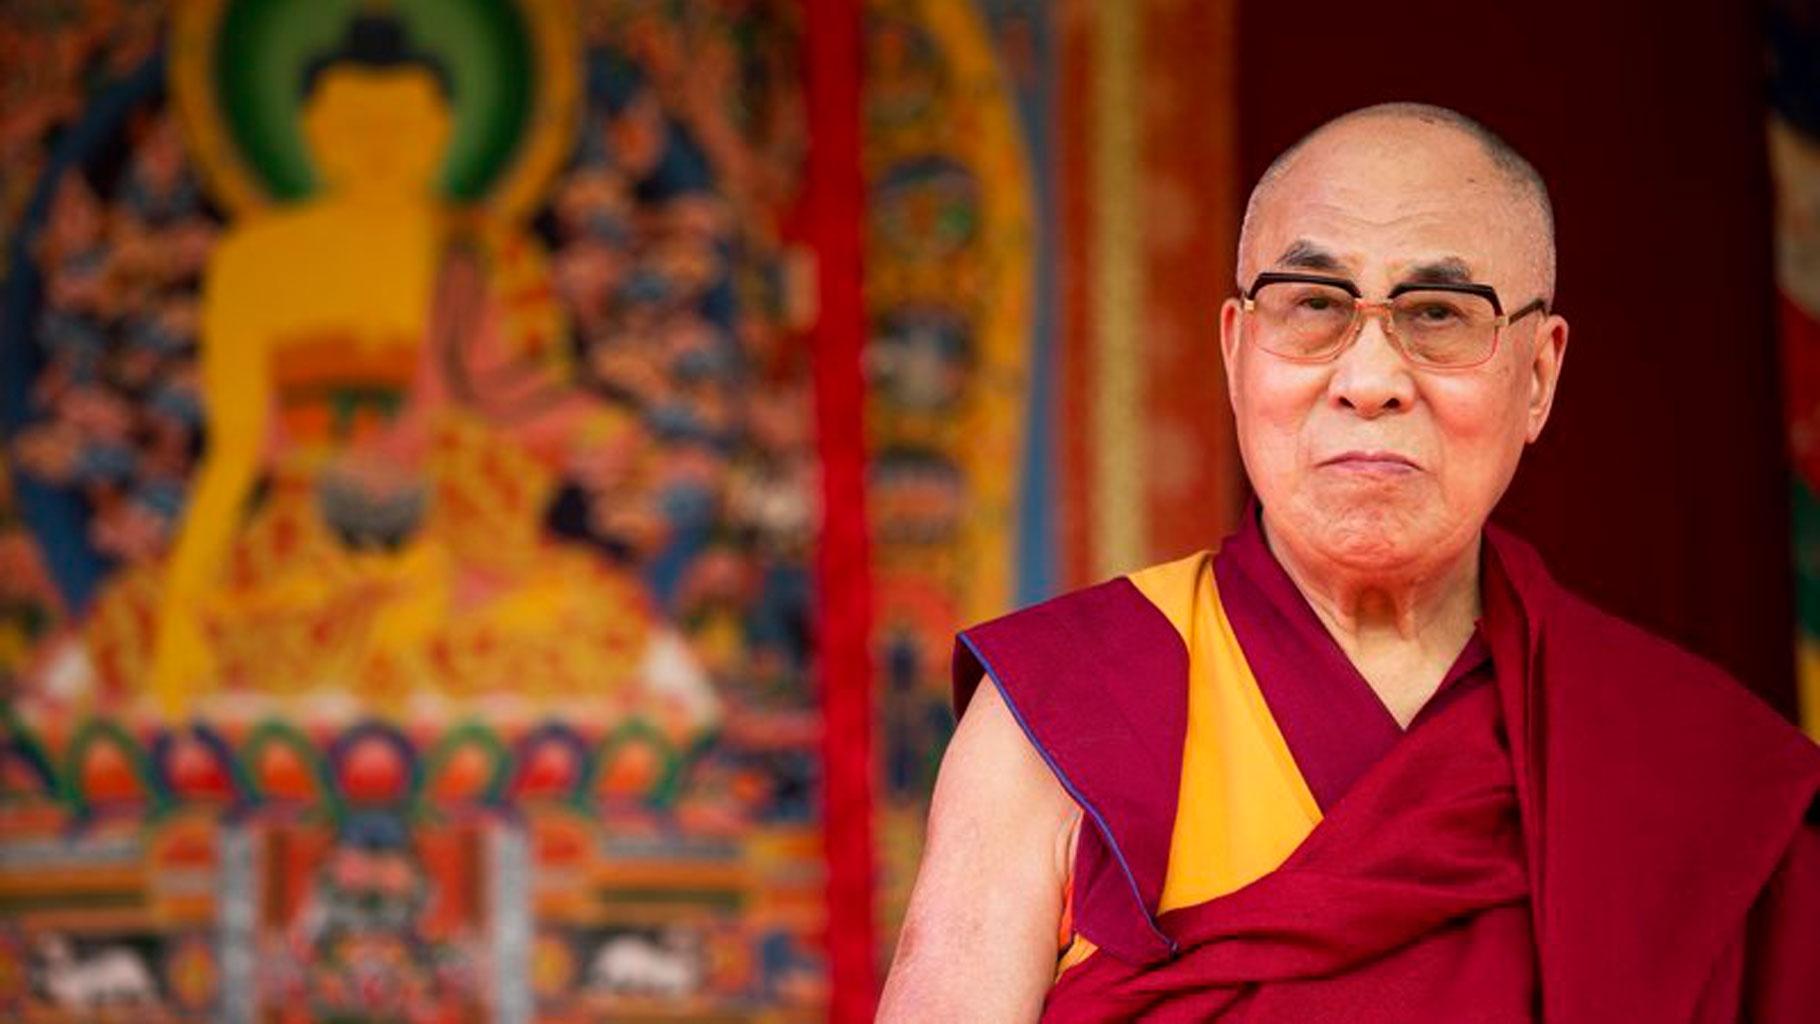 Dalai Lama Says Heir May be From India, China Say They Will Decide